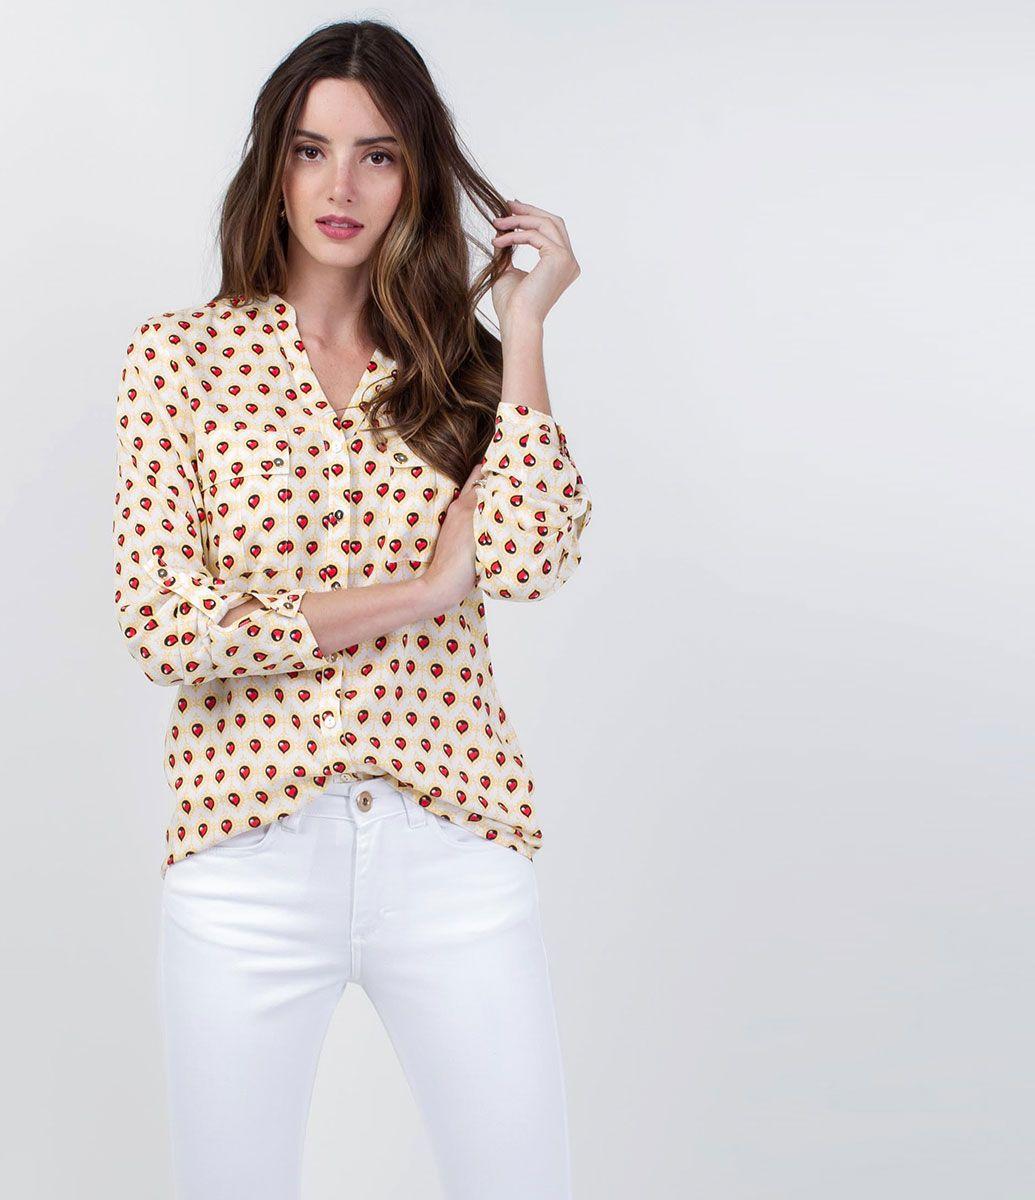 Camisa Feminina Estampada - Lojas Renner | Todo o estilo das camisas ...